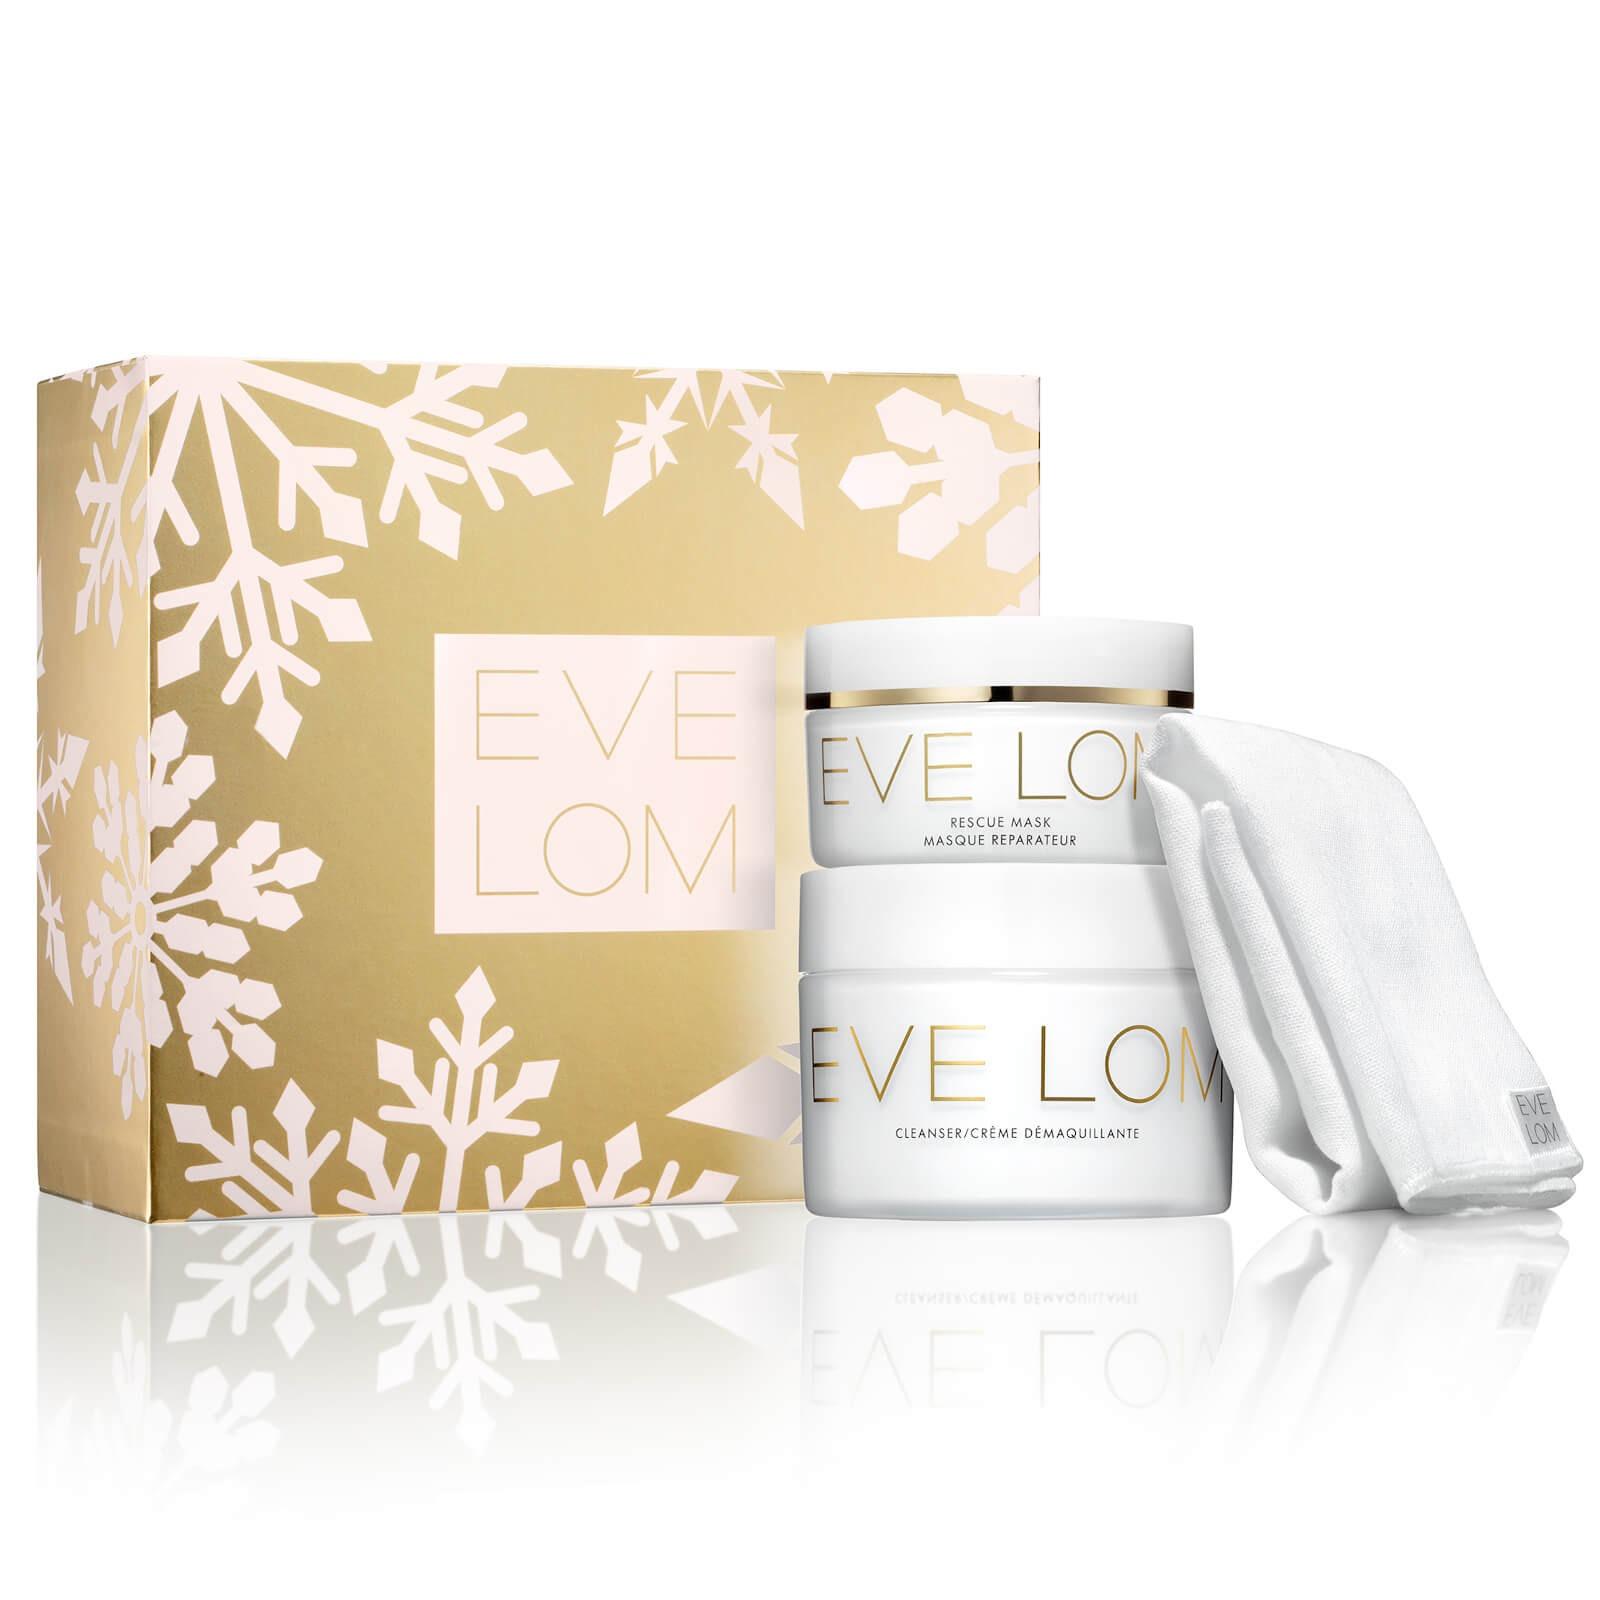 Eve Lom 卸妆膏 200ml+急救面膜100ml+洁面巾套组 价值$232